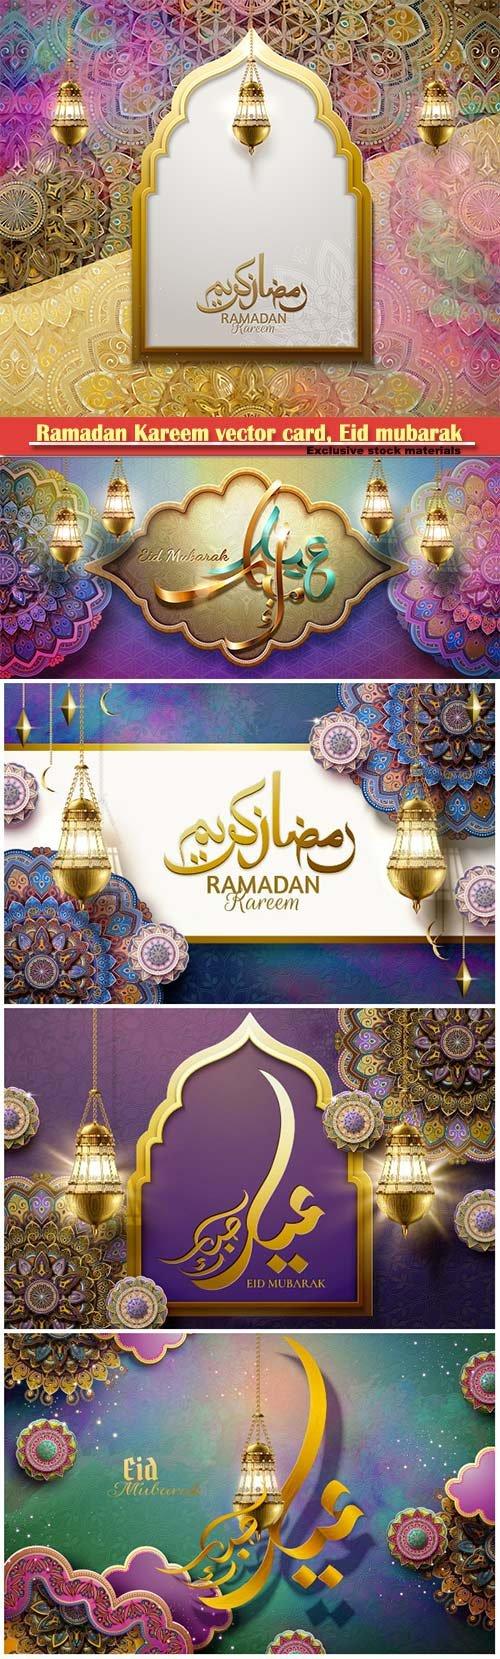 Ramadan Kareem vector card, Eid mubarak calligraphy design templates # 27